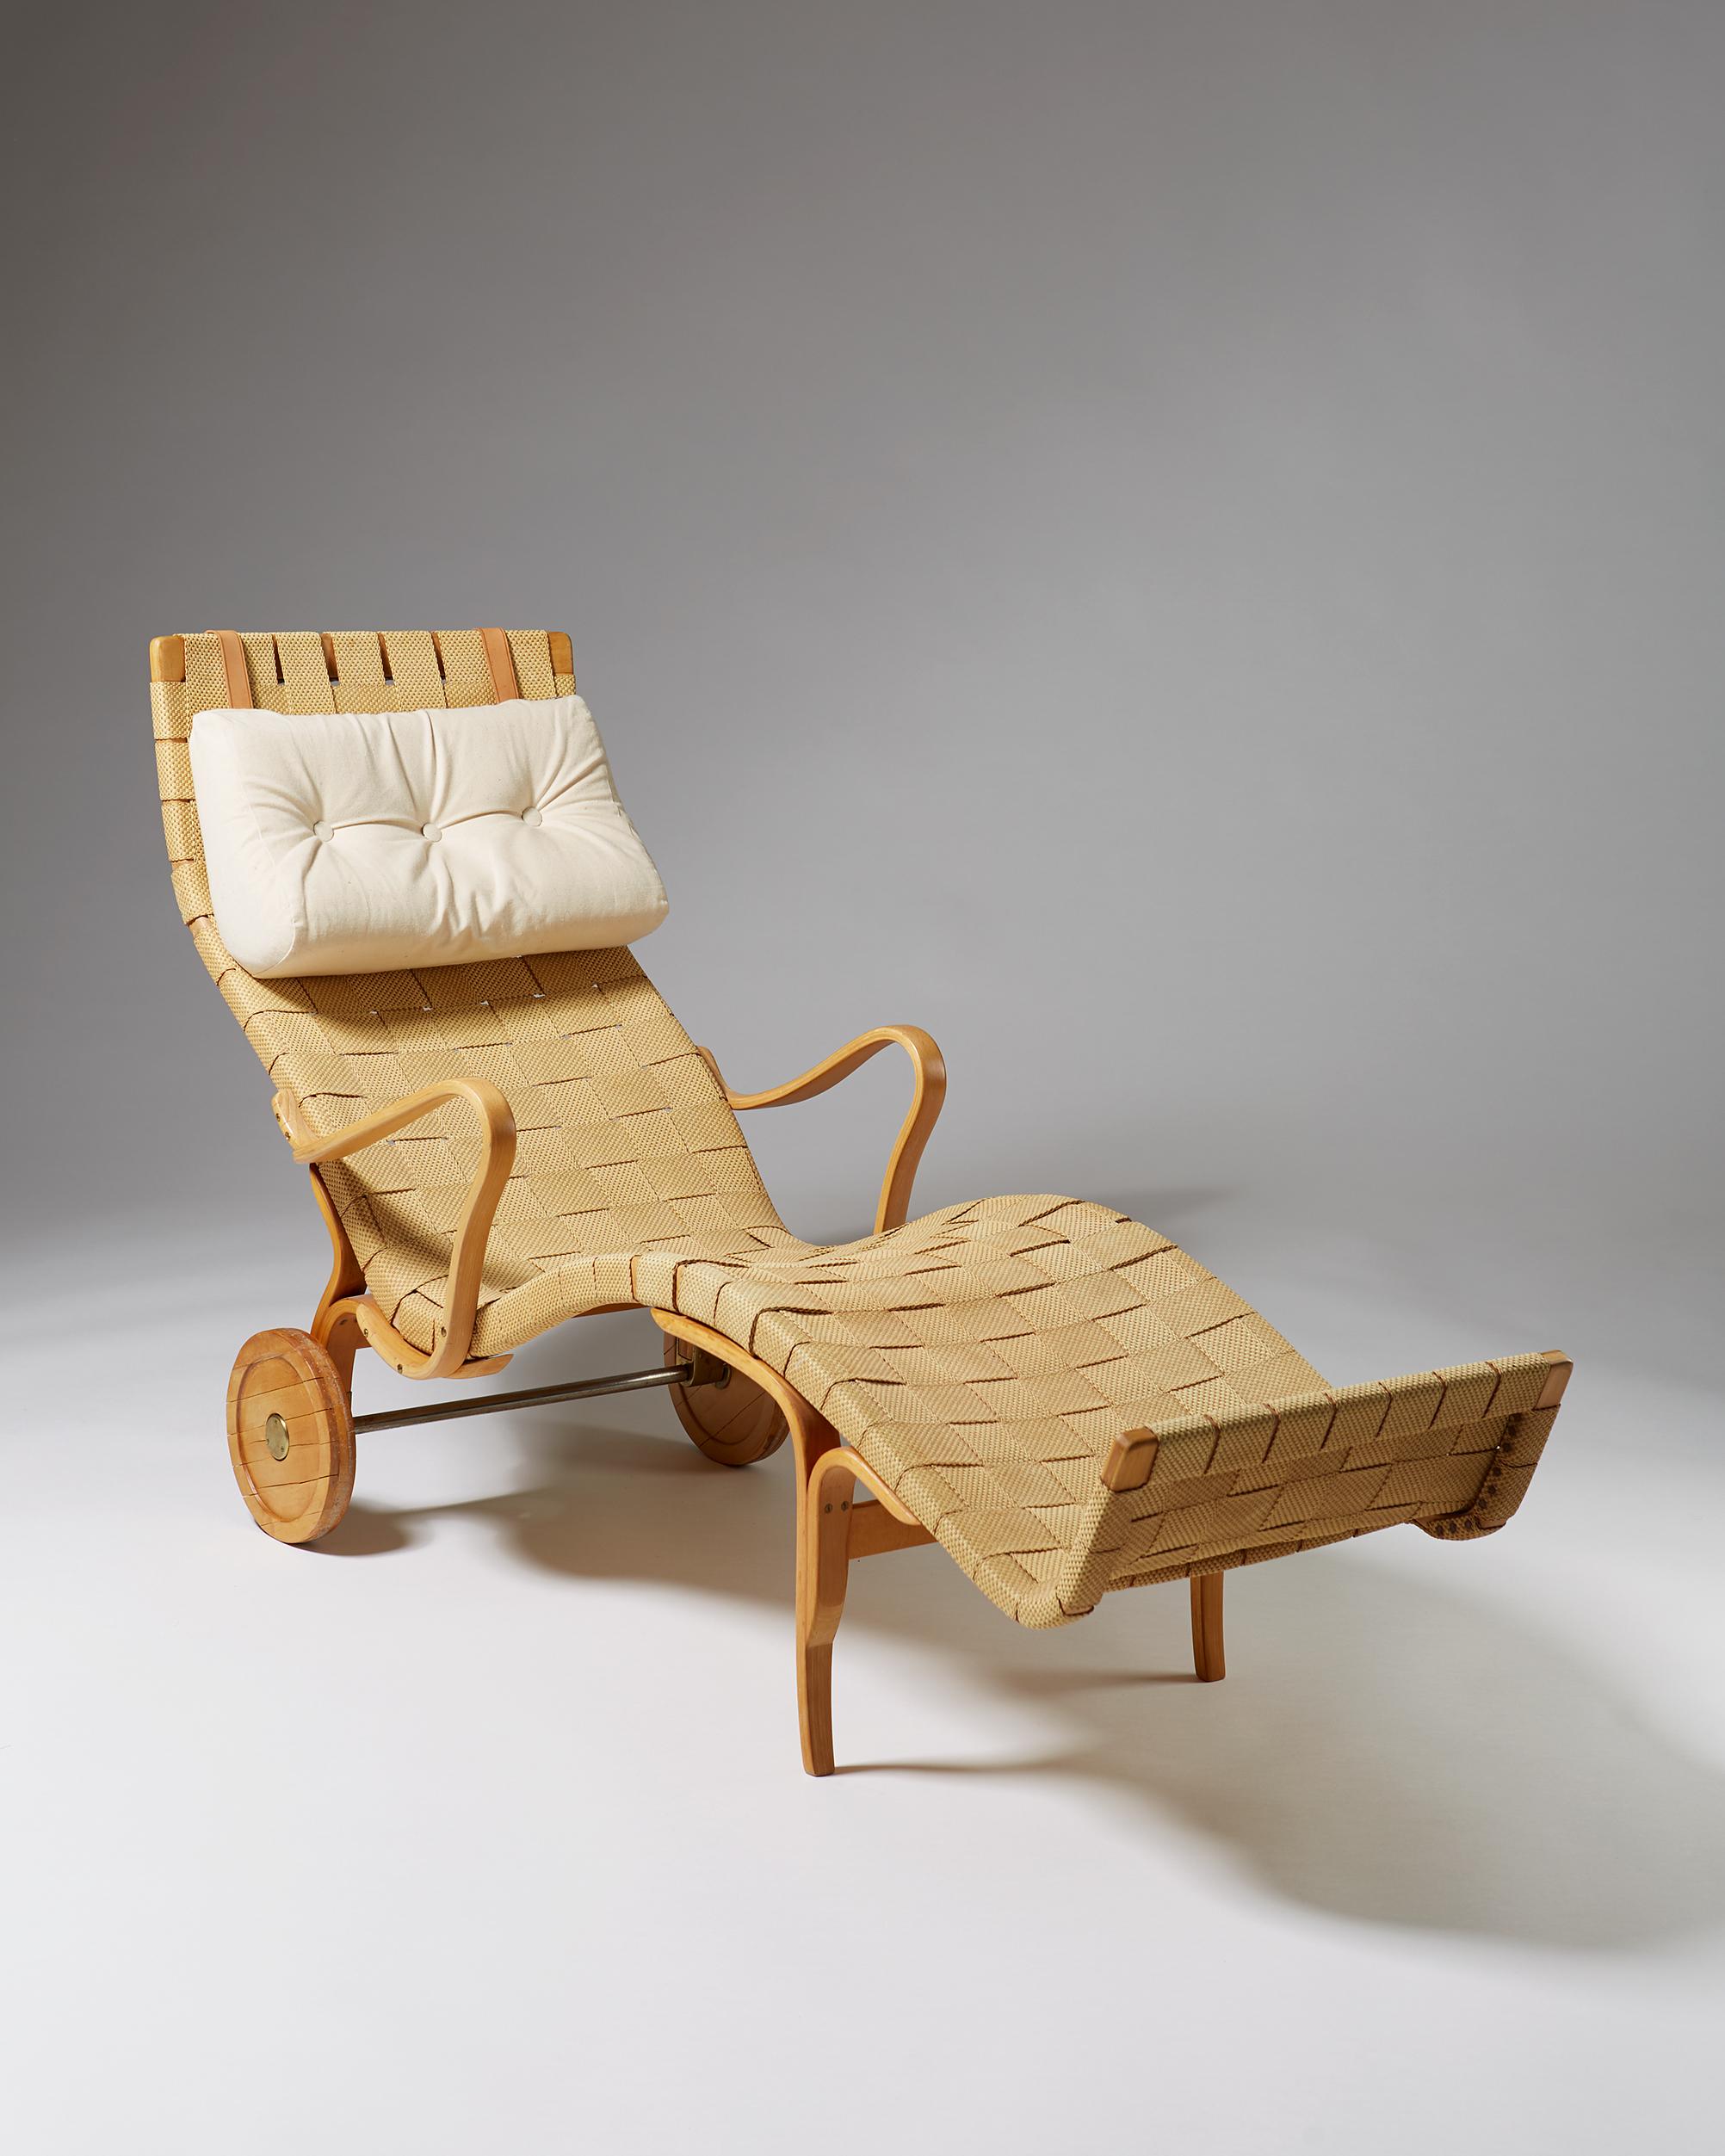 Bruno Mathsson  Chaise longue Sweden, 1940's Beech and original paper webbing. 90 x 163 x 63 cm Seat: 30 cm Armrest: 54,5 cm